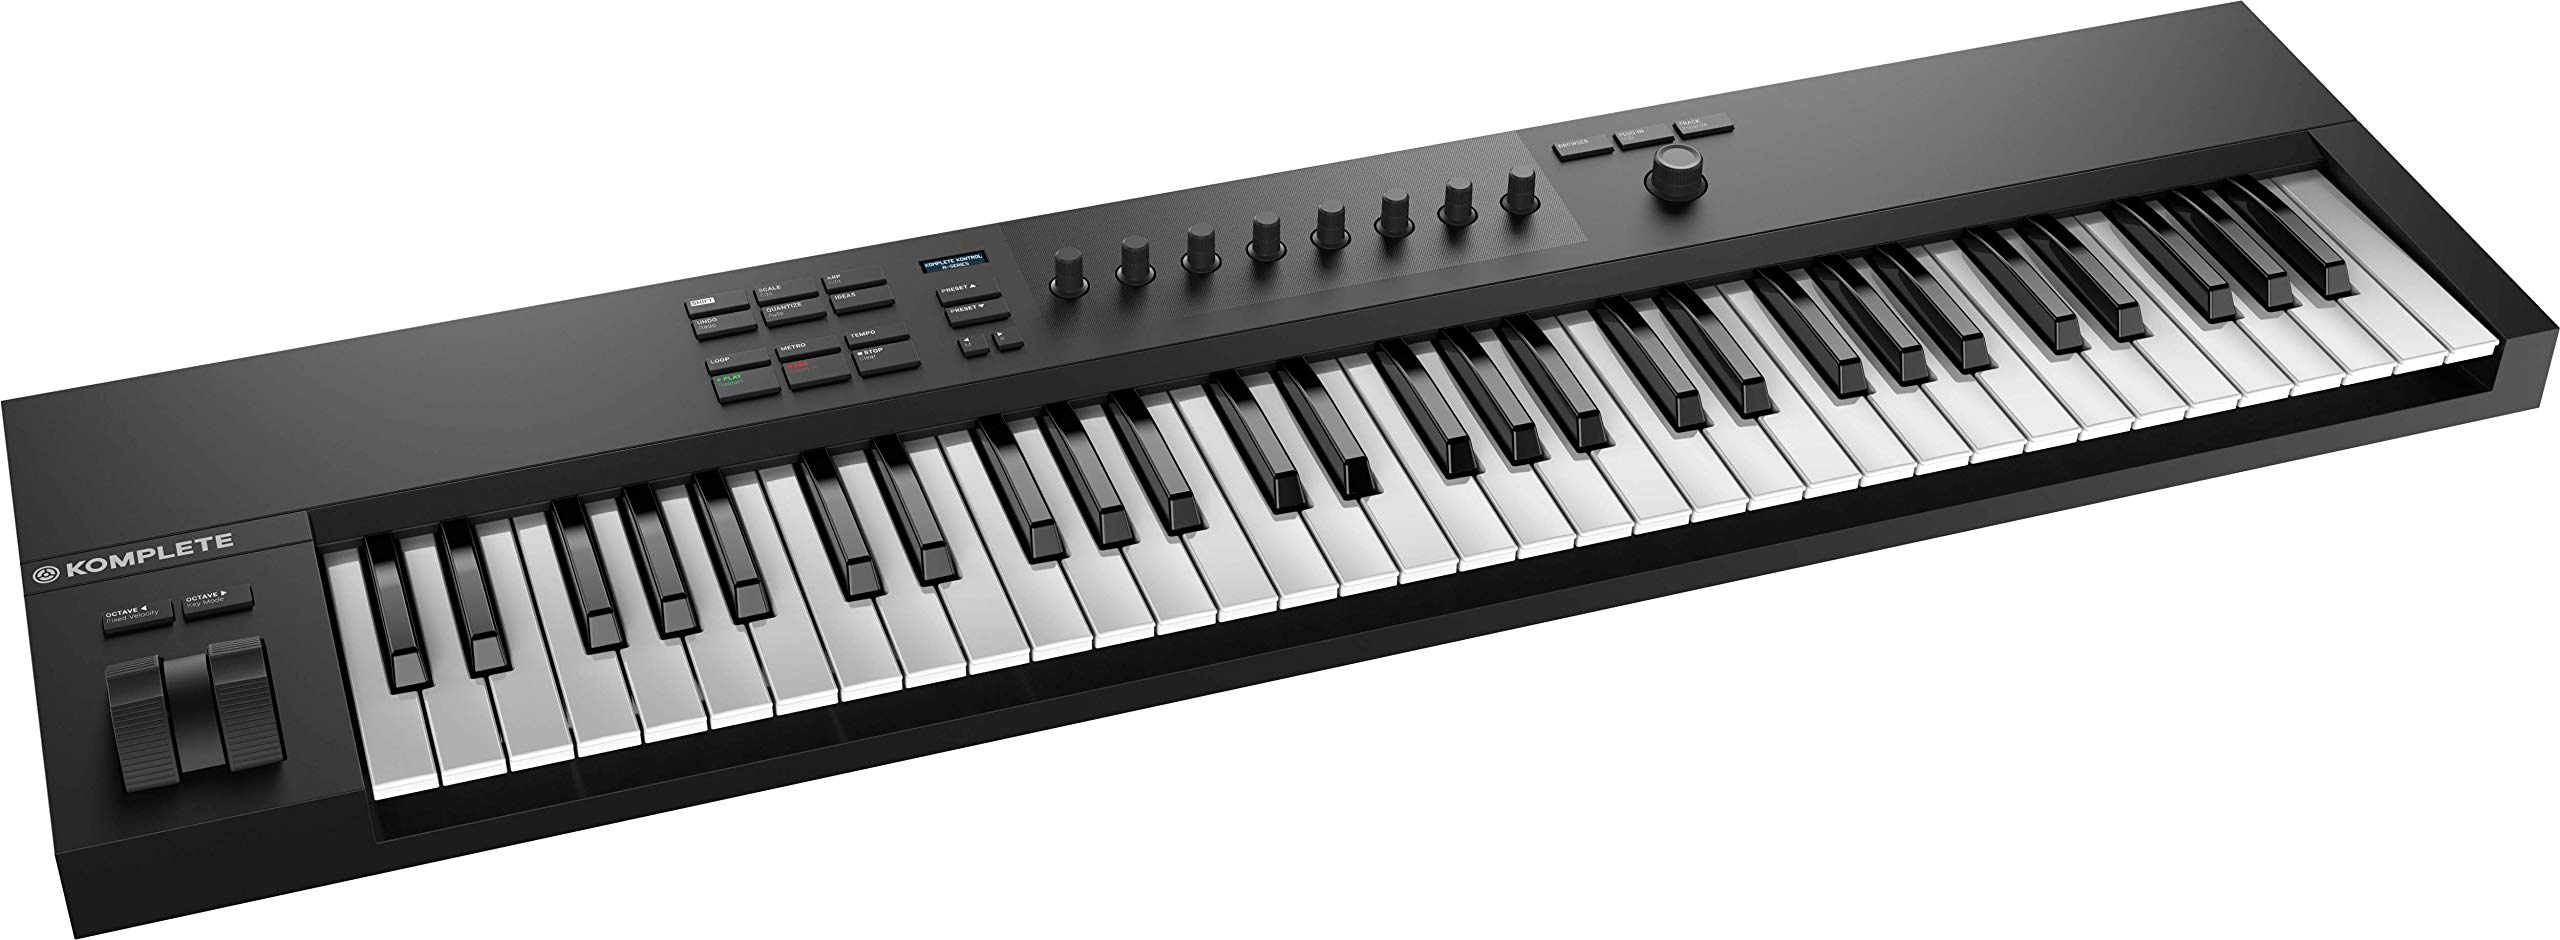 Native Instruments Komplete Kontrol A61 Controller Keyboard by Native Instruments